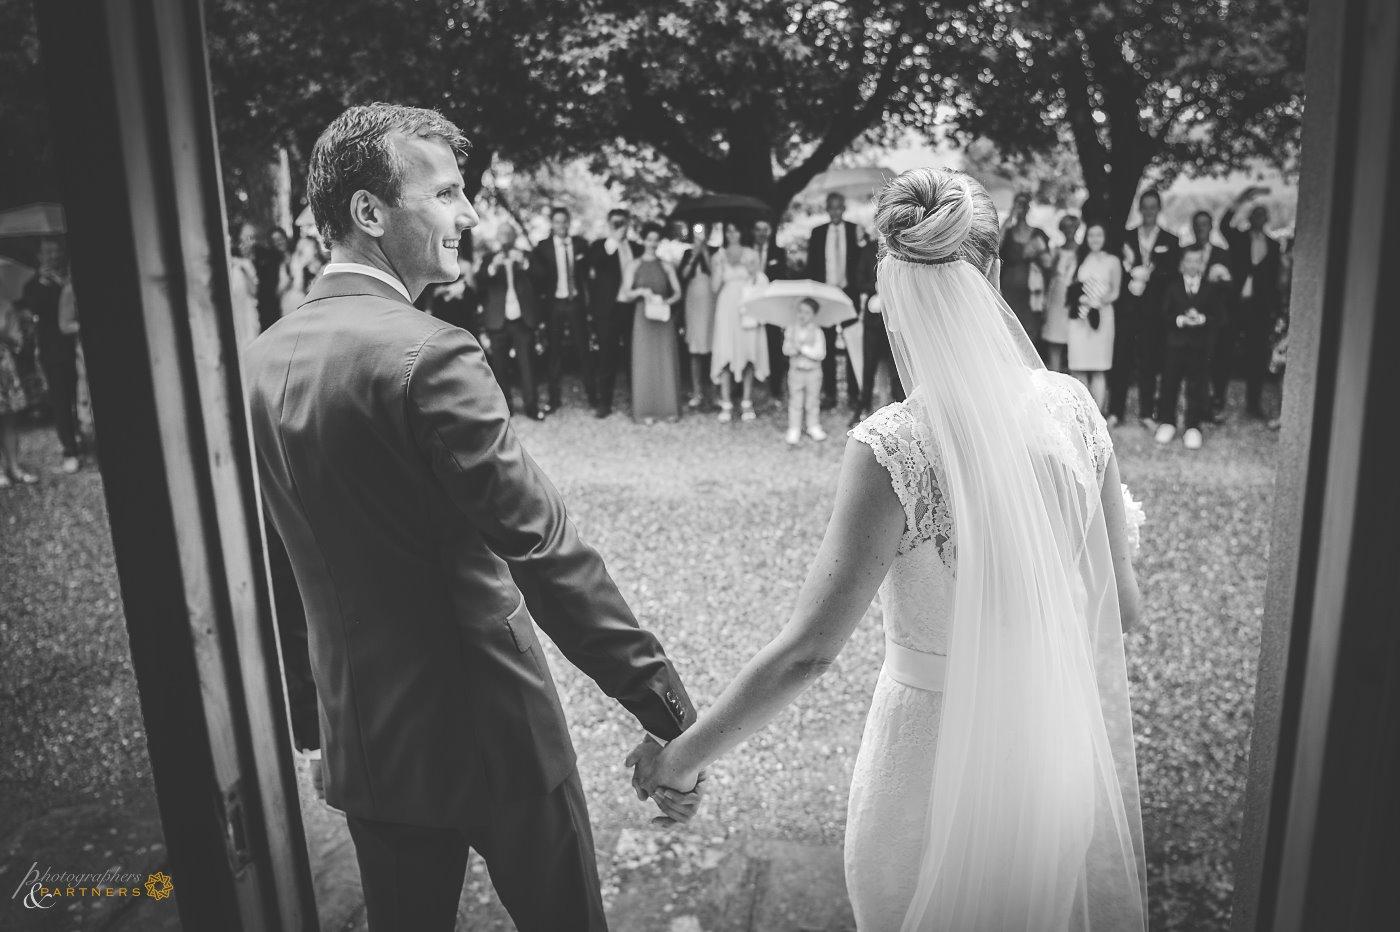 photographer_weddings_siena_04.jpg